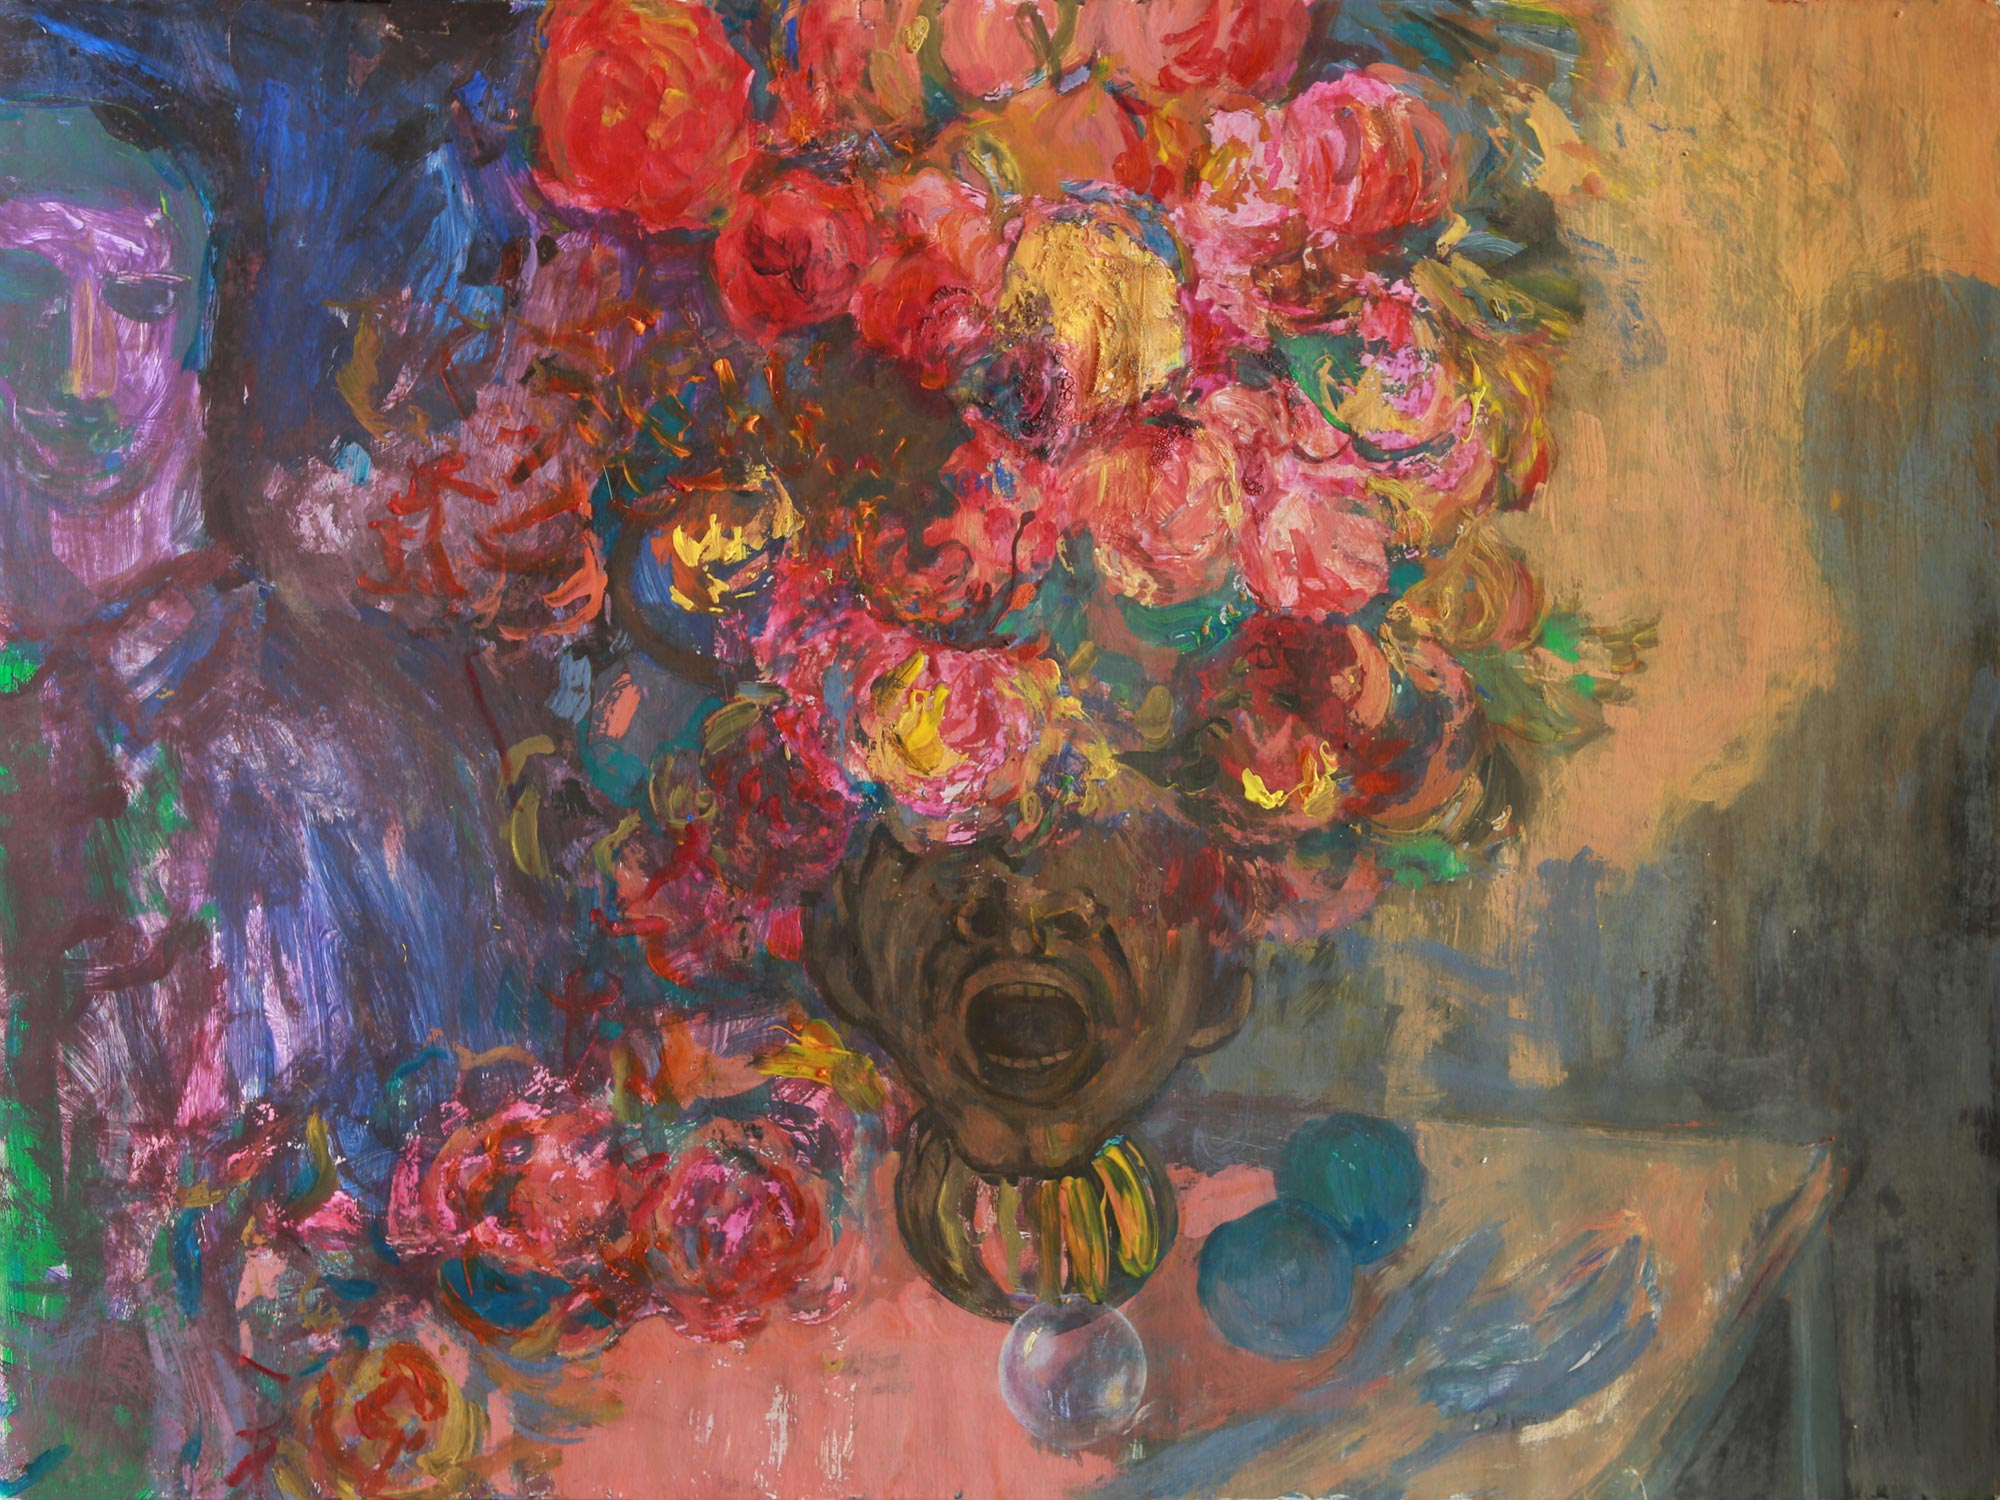 acrylic painting Screaming Vase